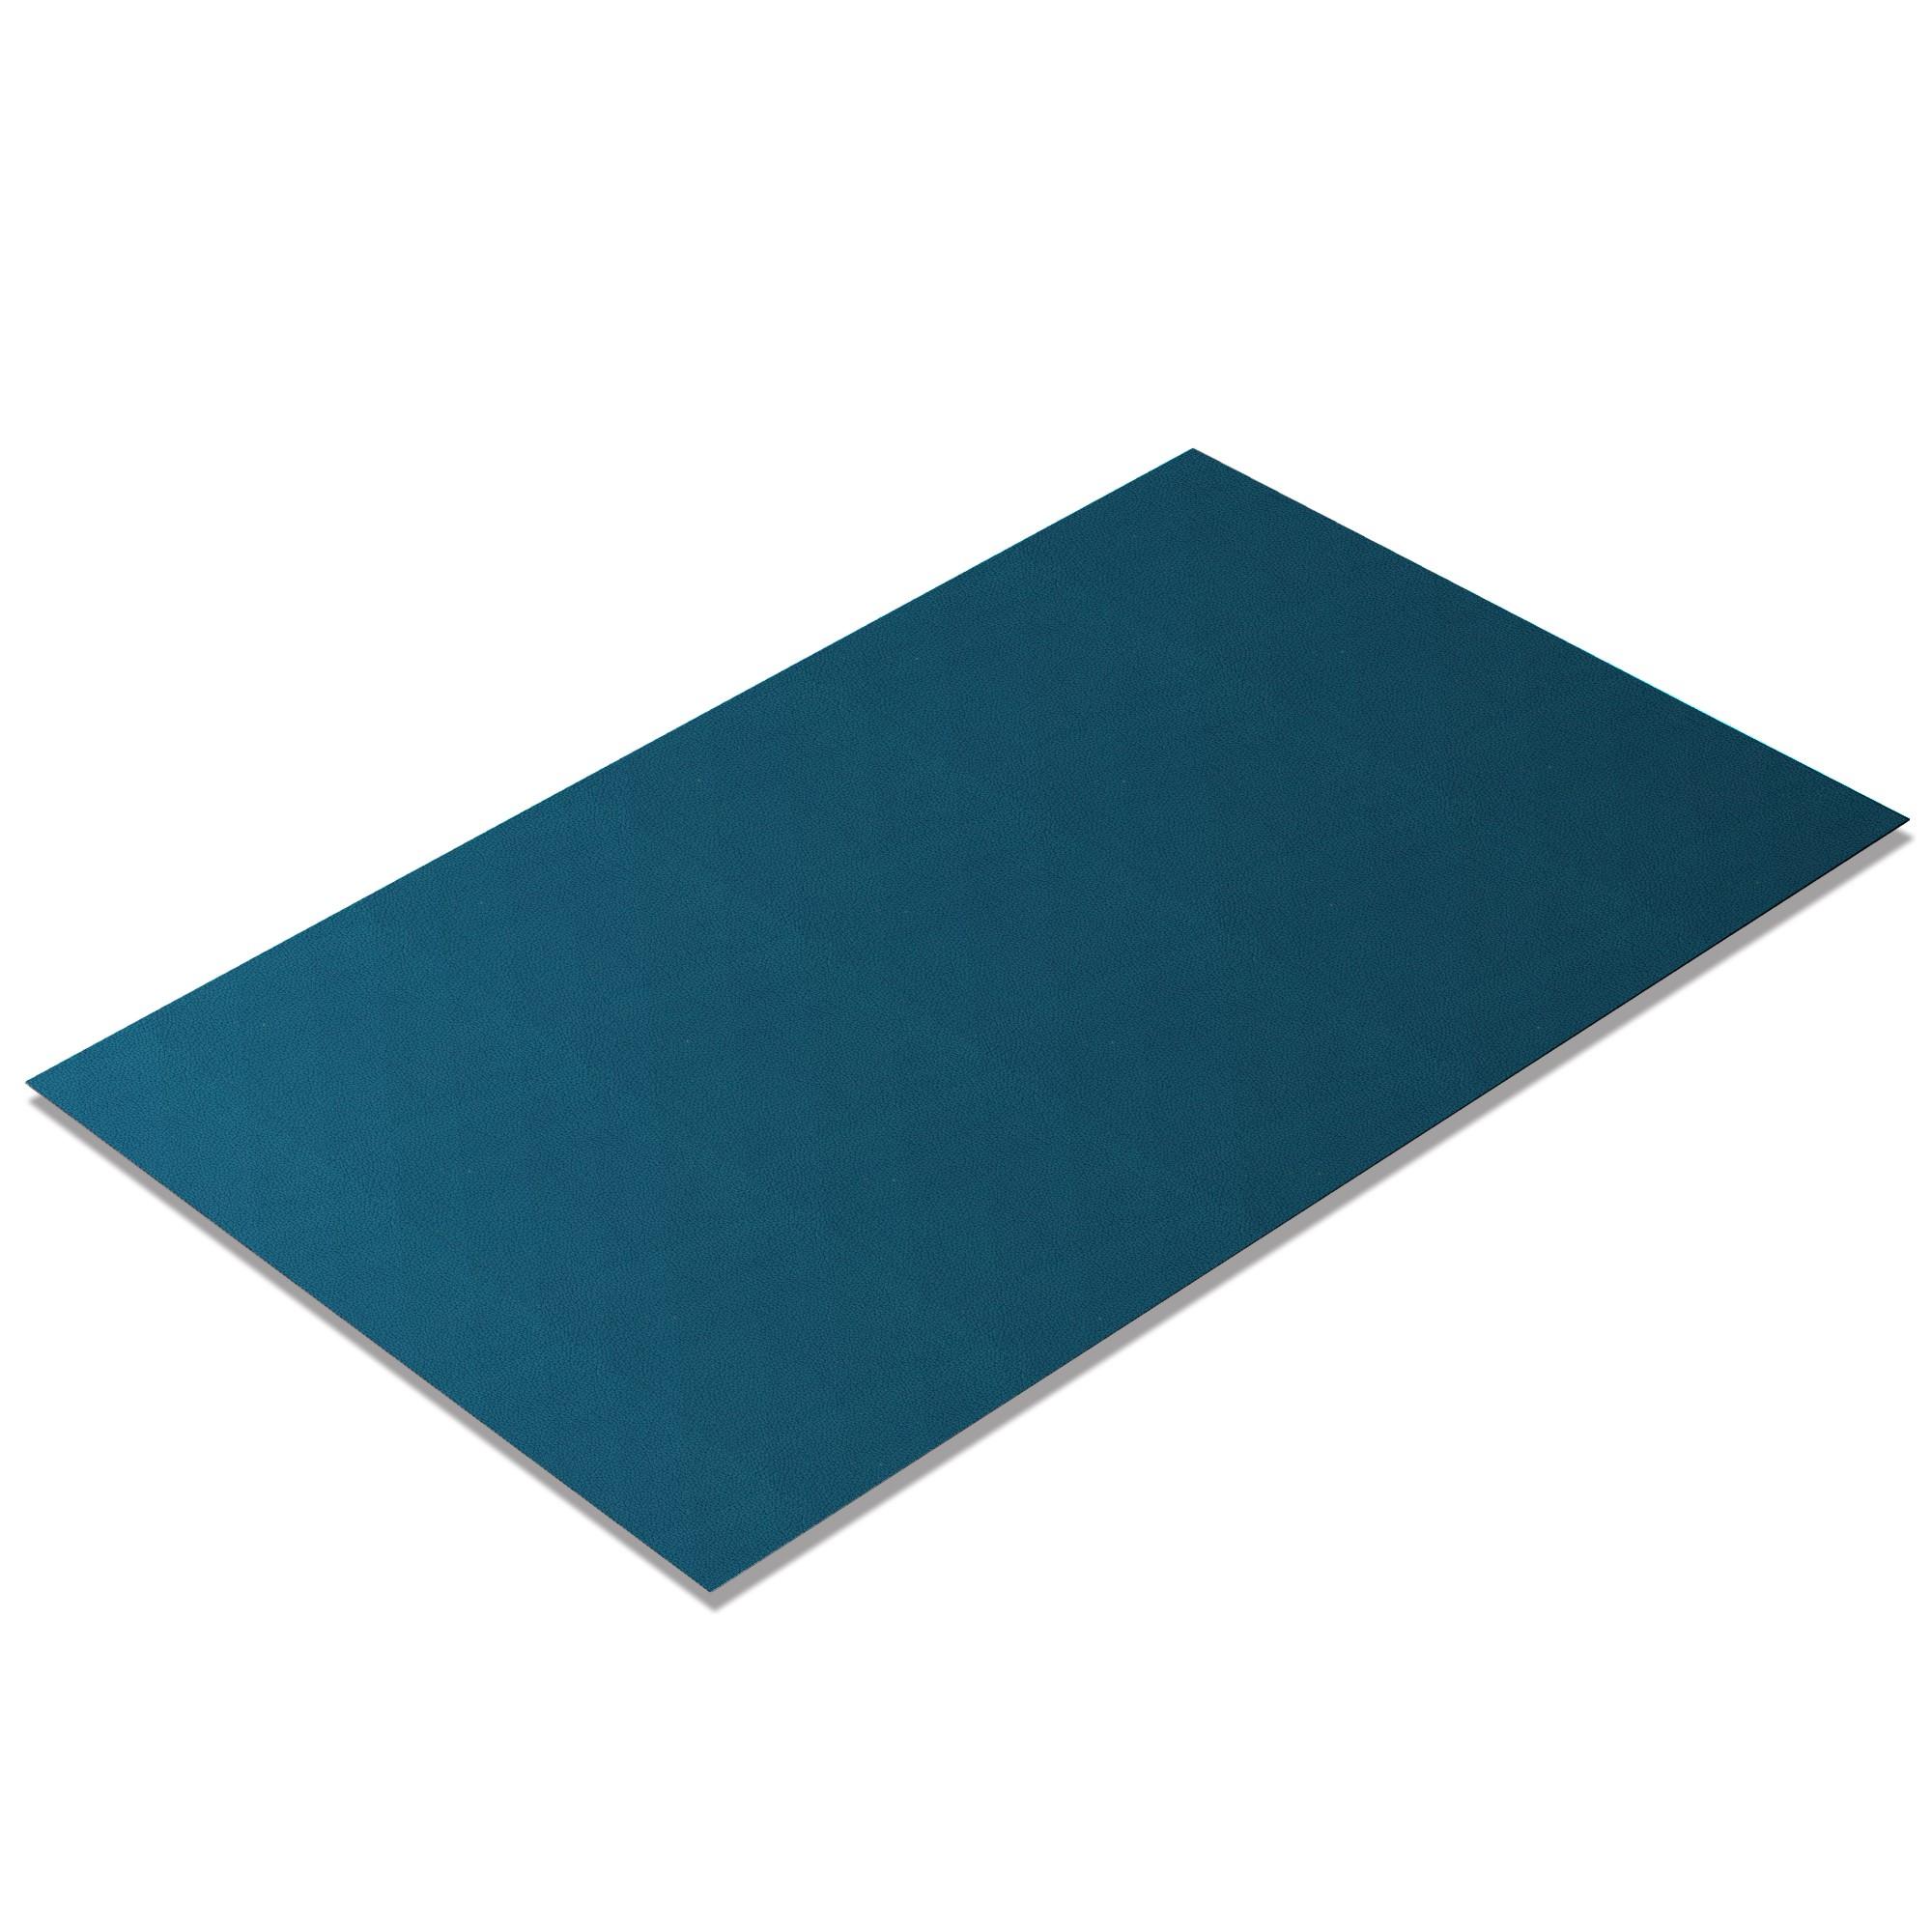 Kunstleder Meterware Latigo Turquoise [LAT513]